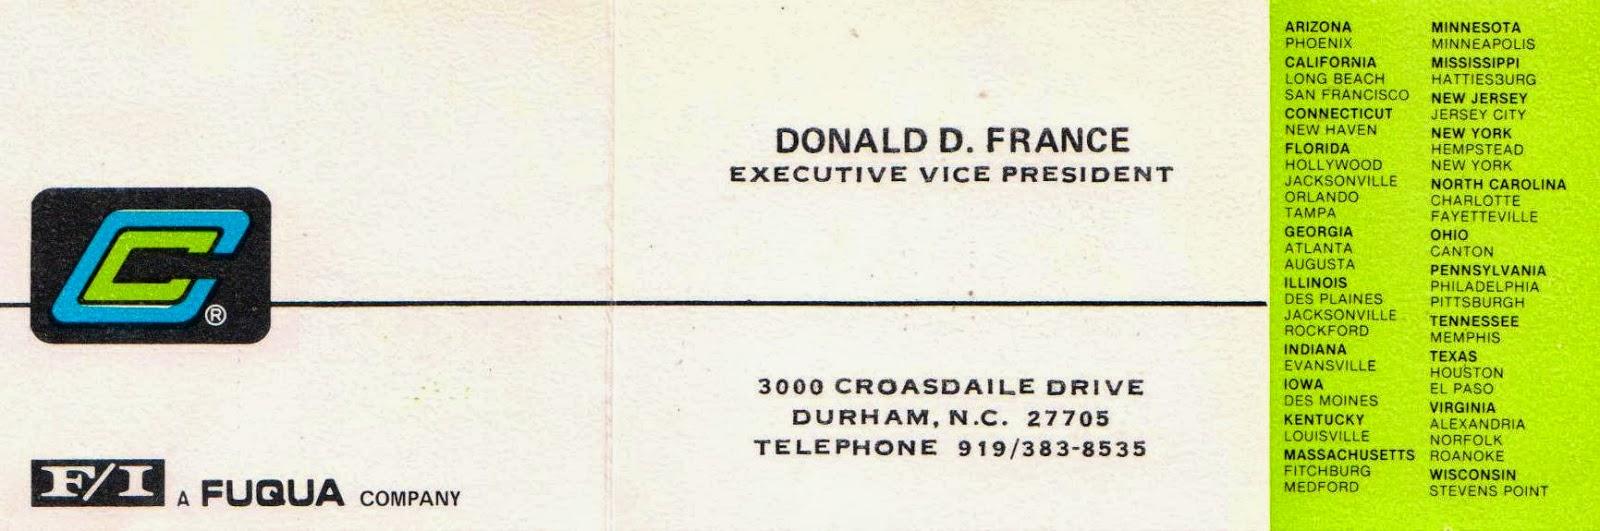 Speak memory time regained donald delbert france business cards donald delbert france business cards 1970s 1980s reheart Images